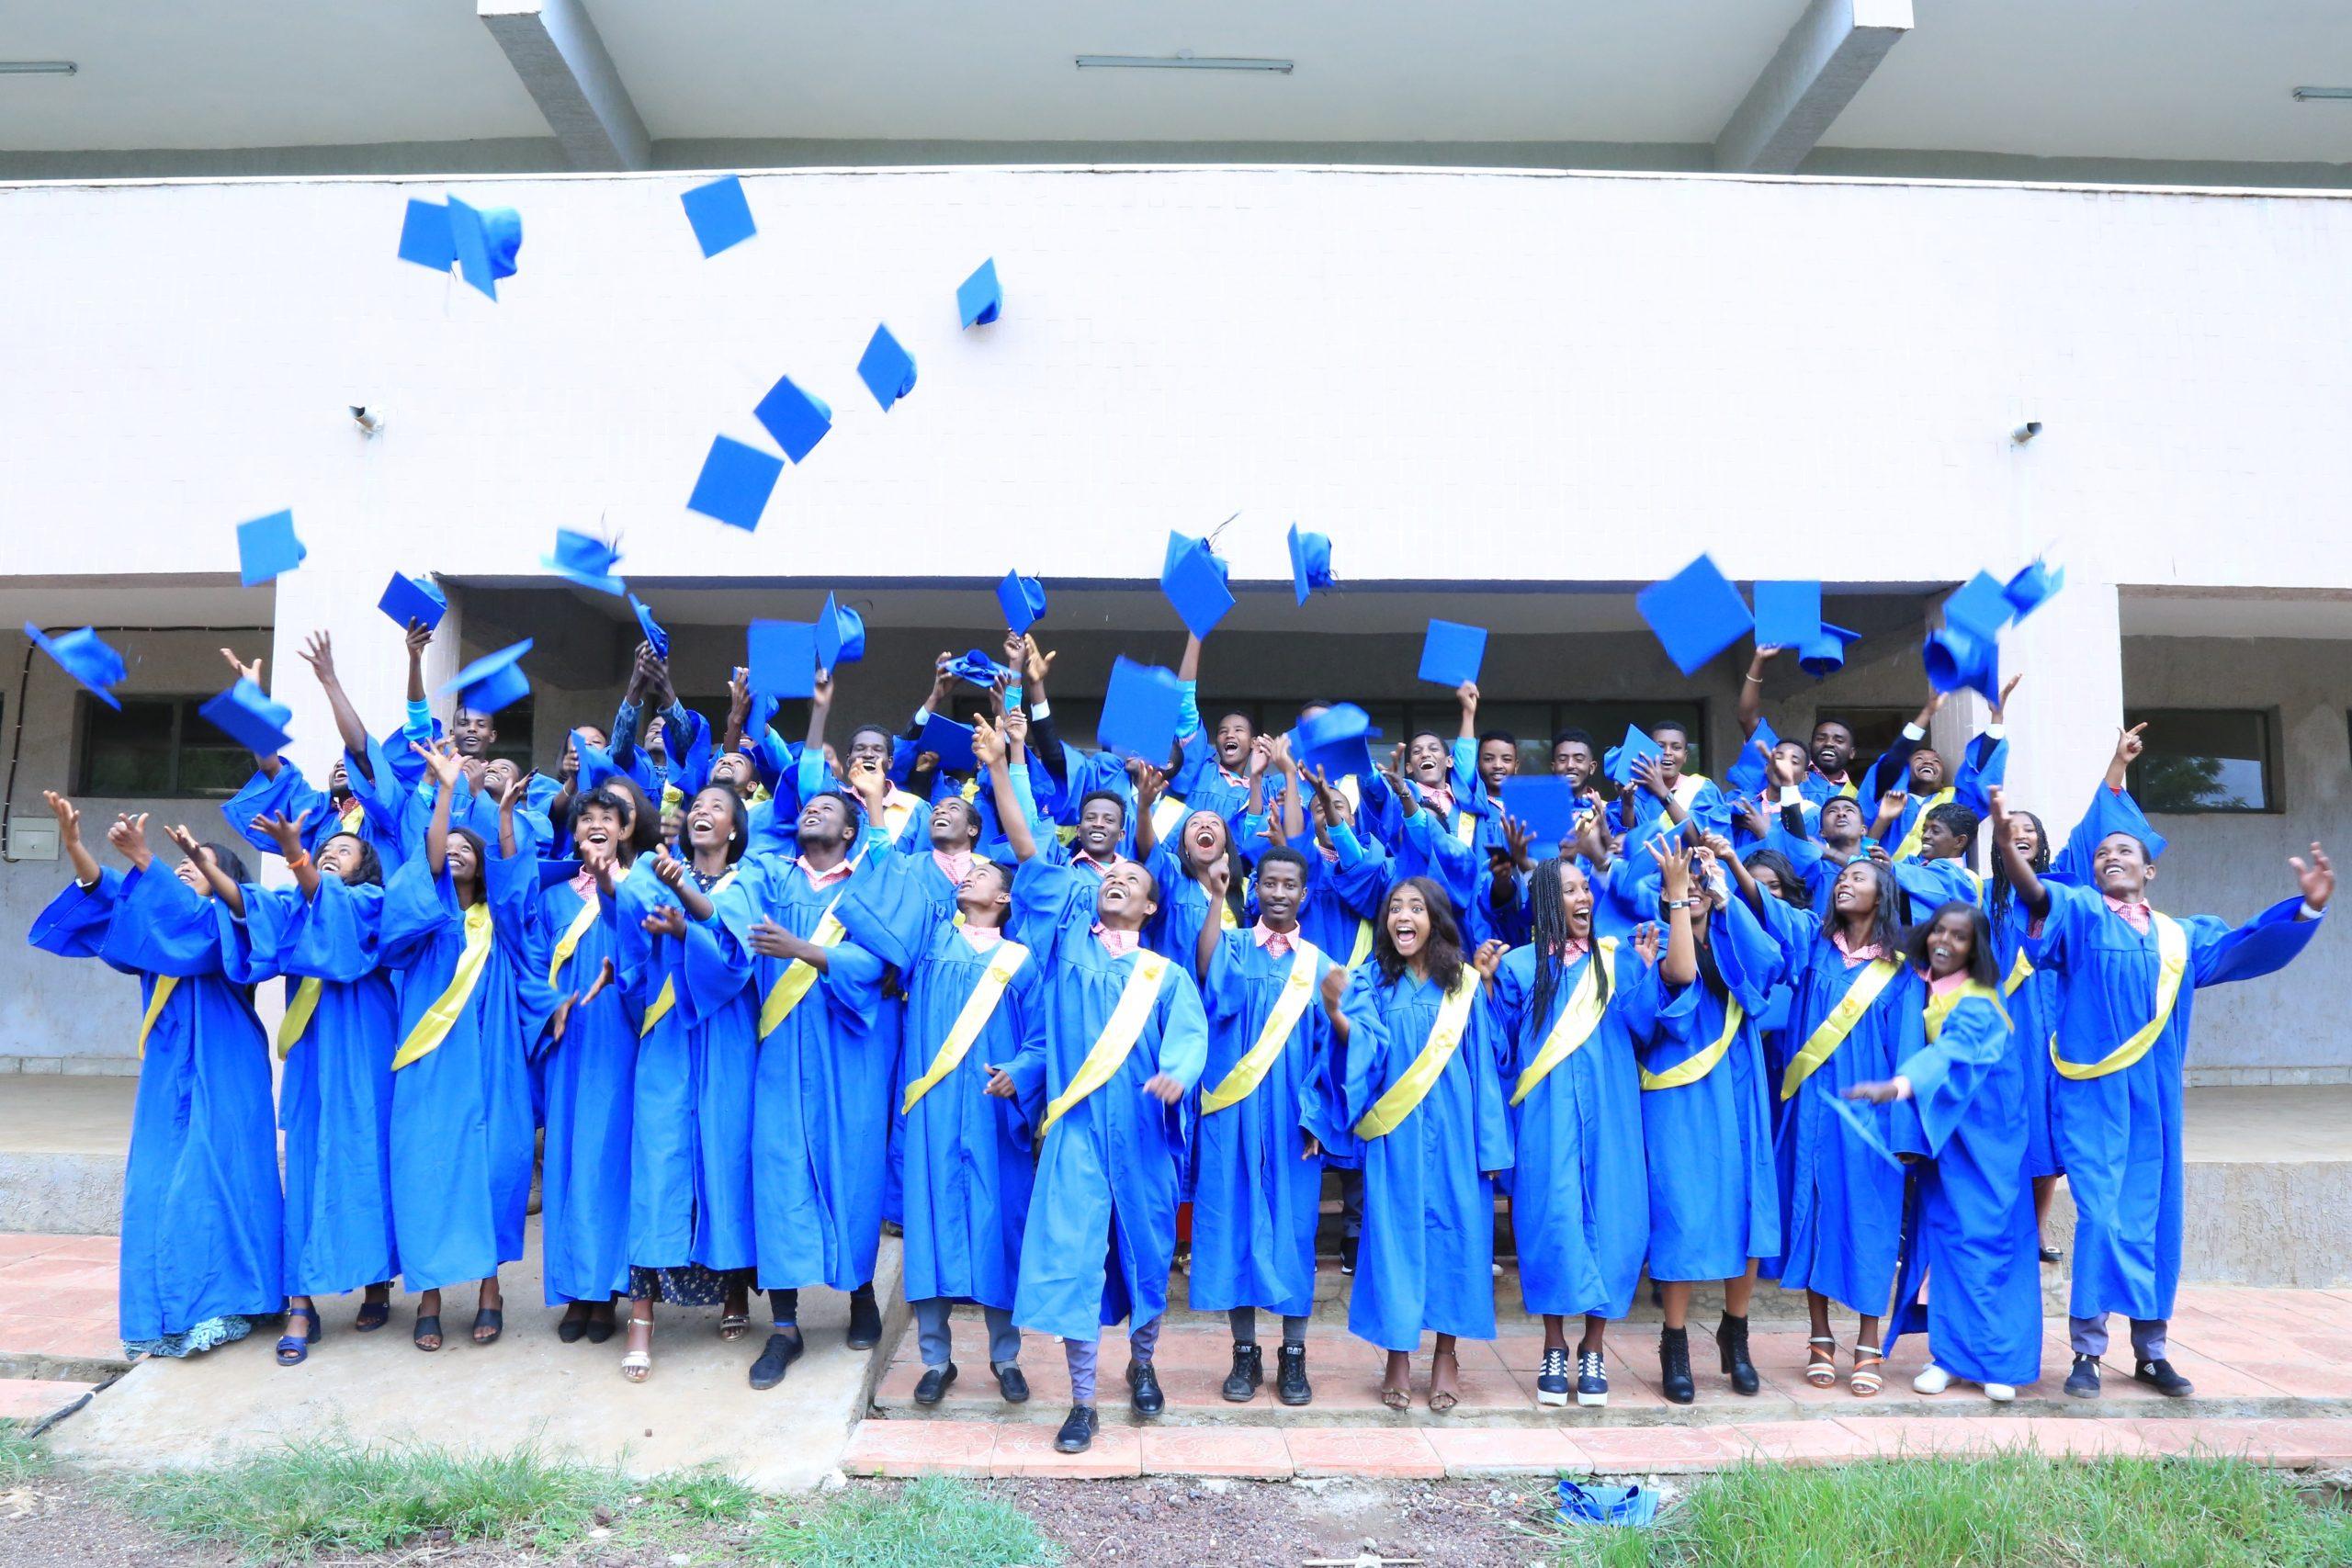 https://go.teachbeyond.org/site-content/uploads/sites/12/2021/01/Hosanna_Graduates-scaled.jpg